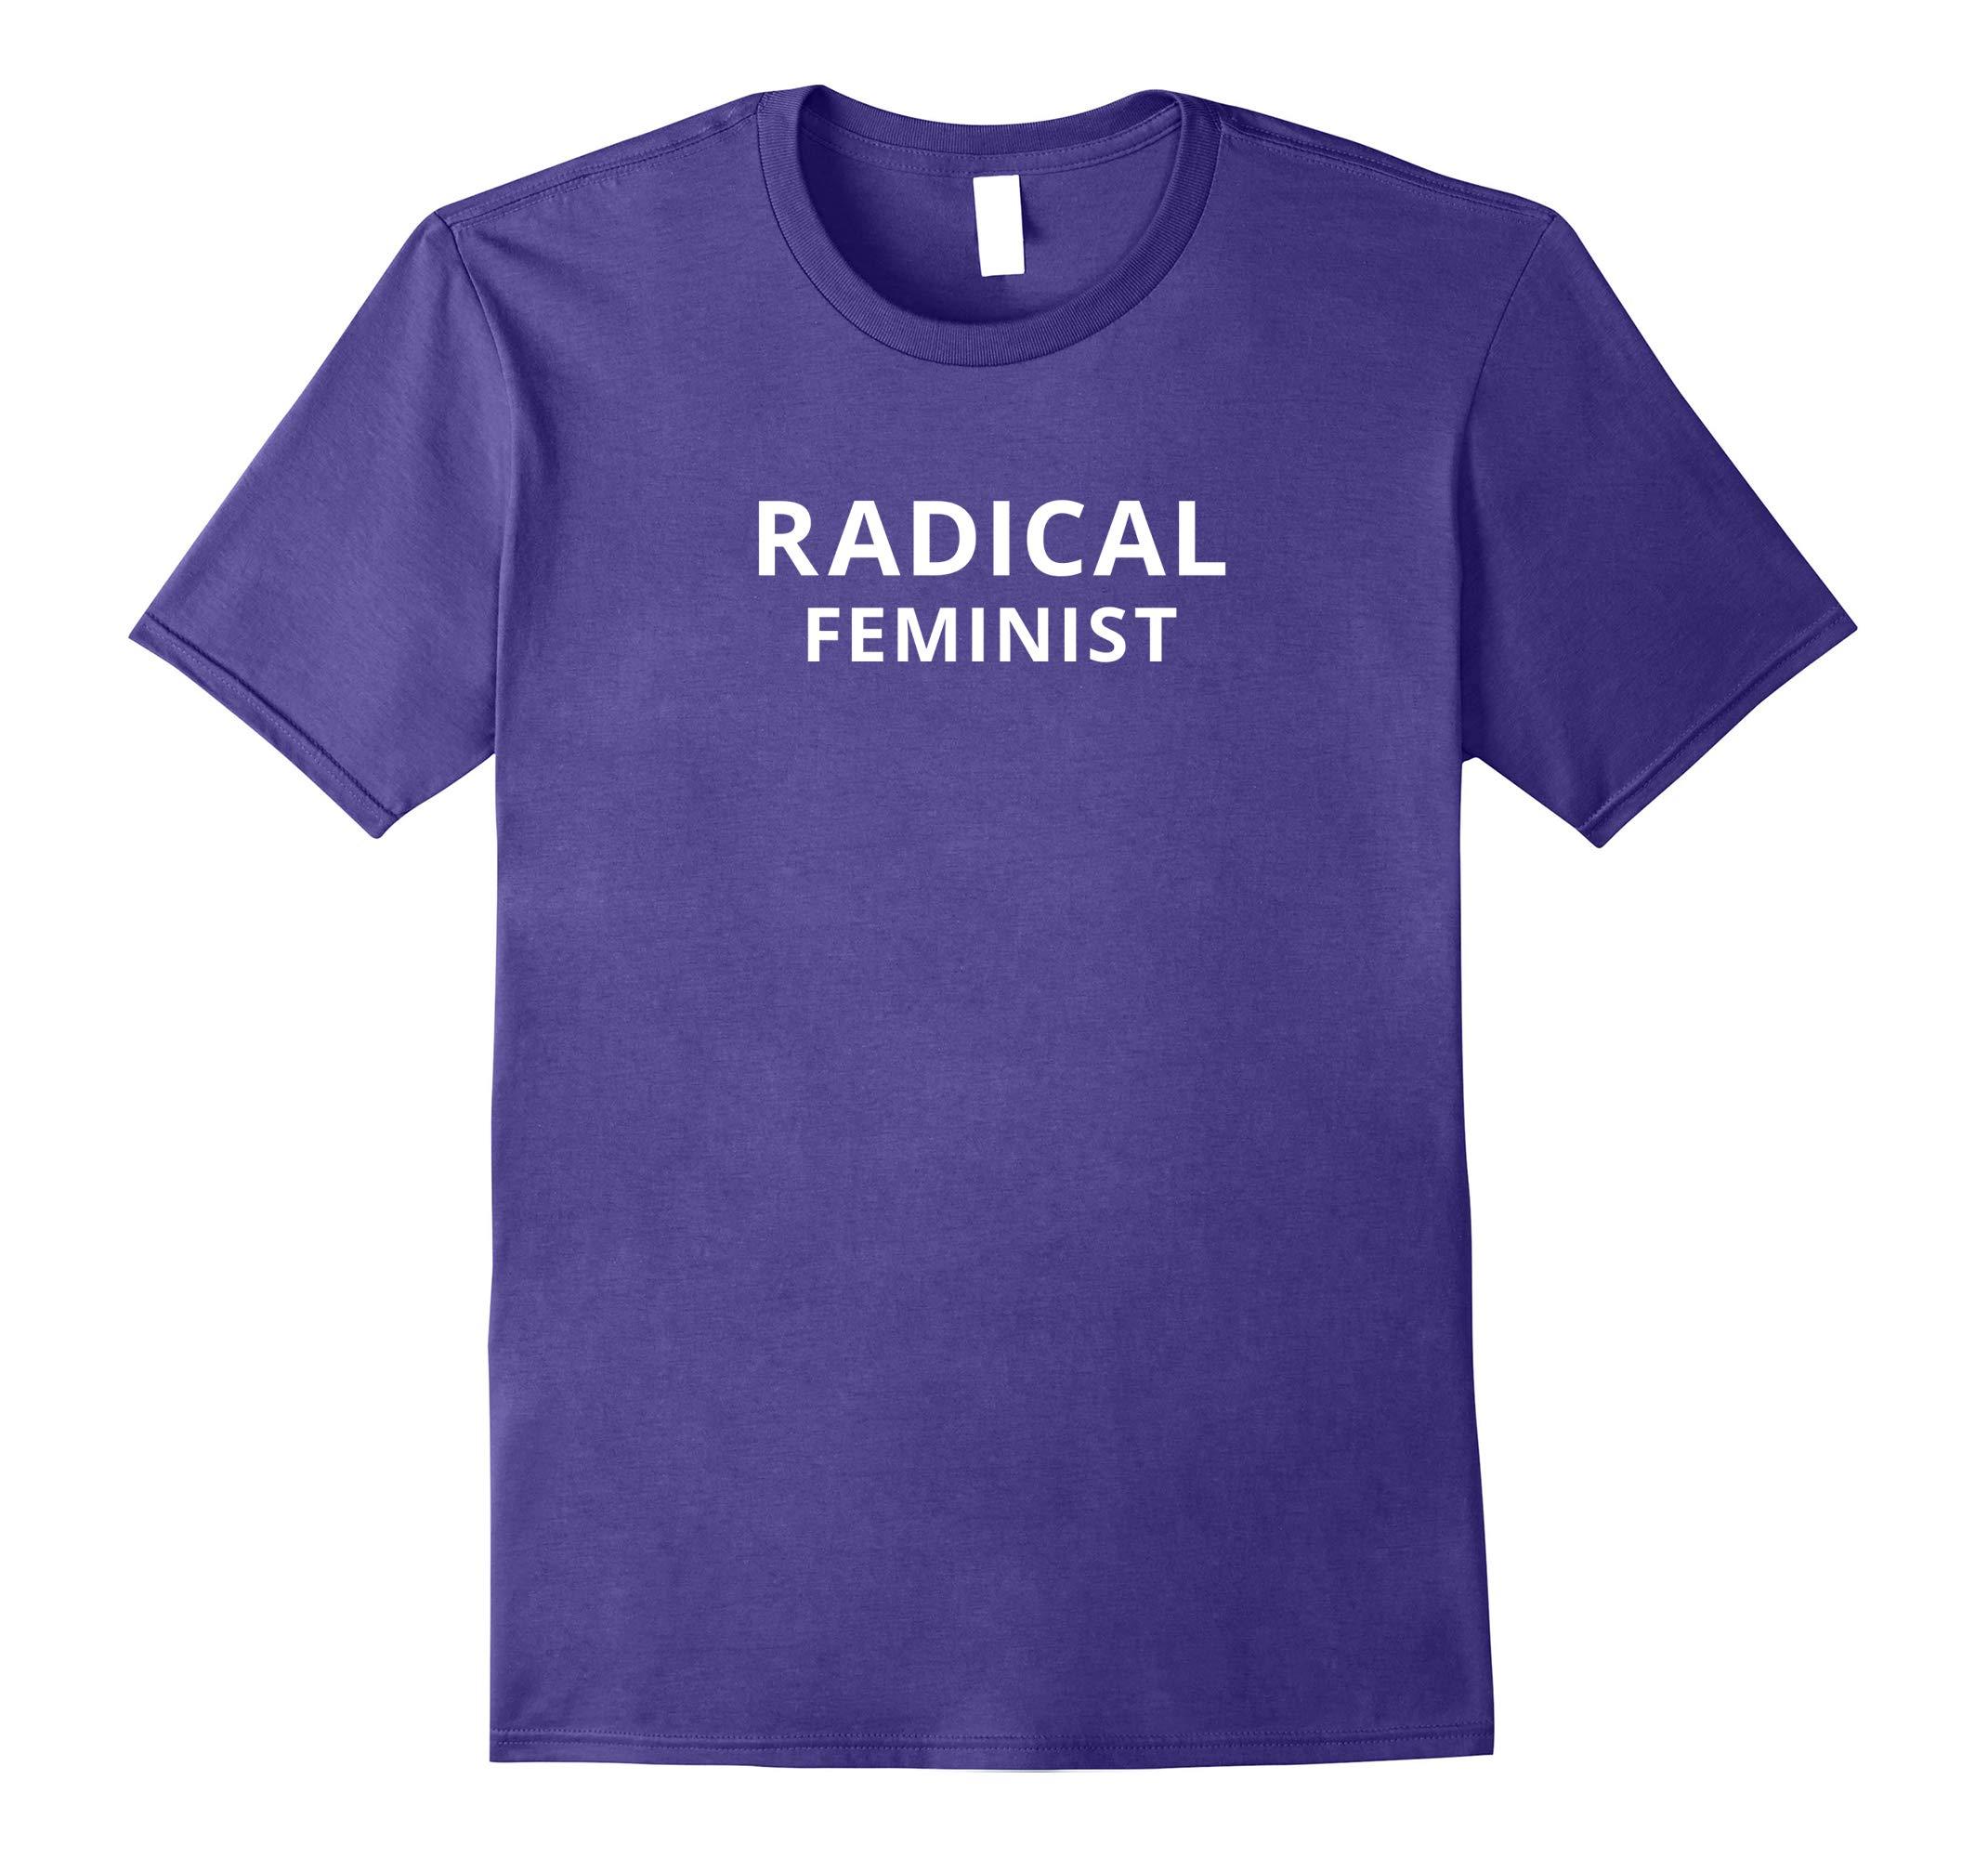 Radical Feminist Shirt   T-shirt Tee-RT